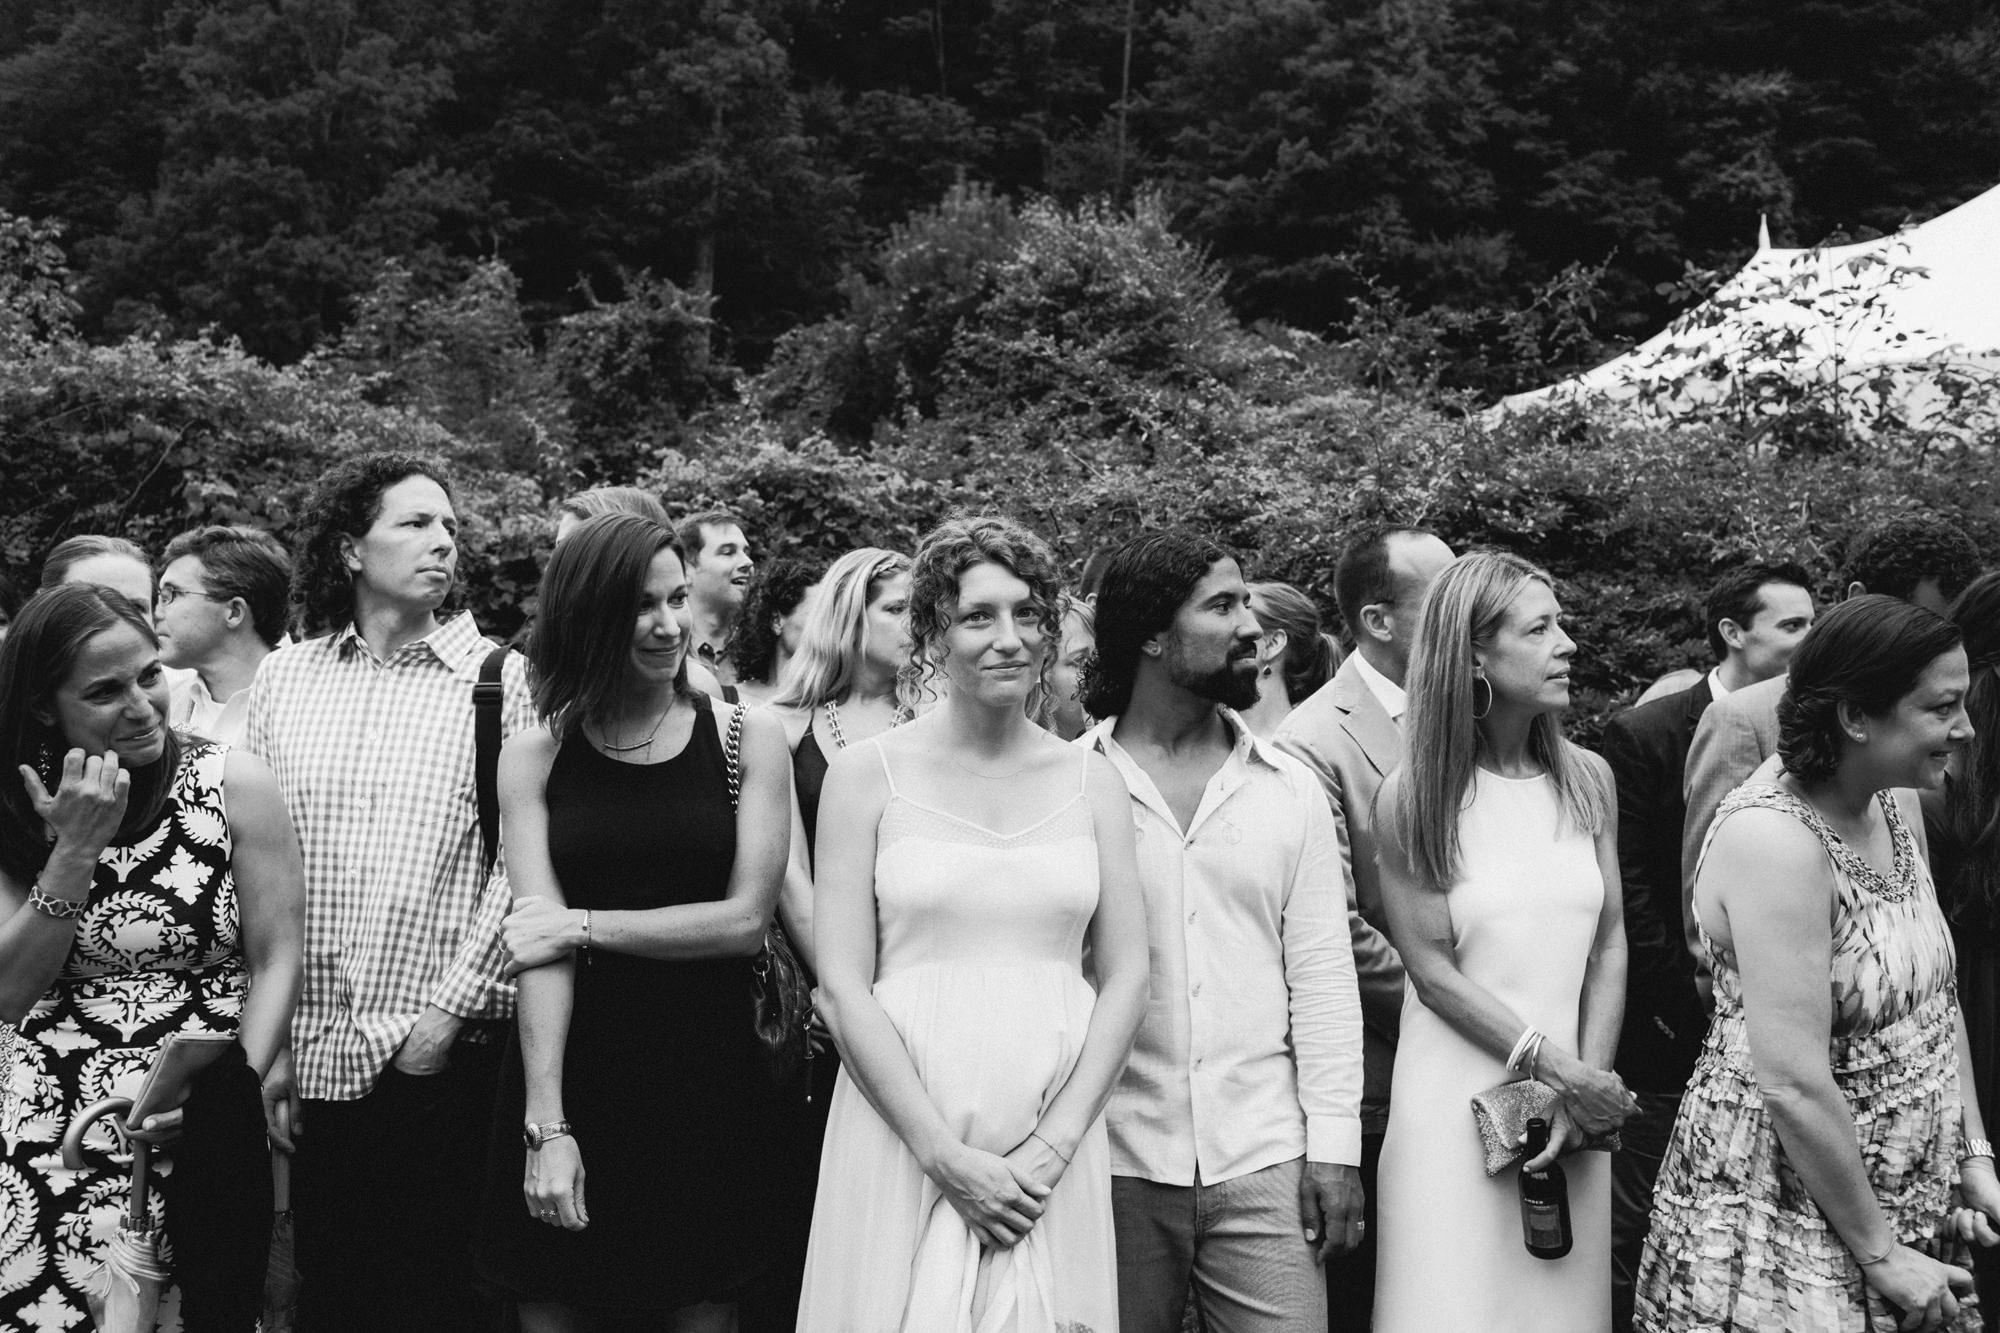 catskills_big_indian_springs_upstate_NY_wedding_sammblake049.jpg